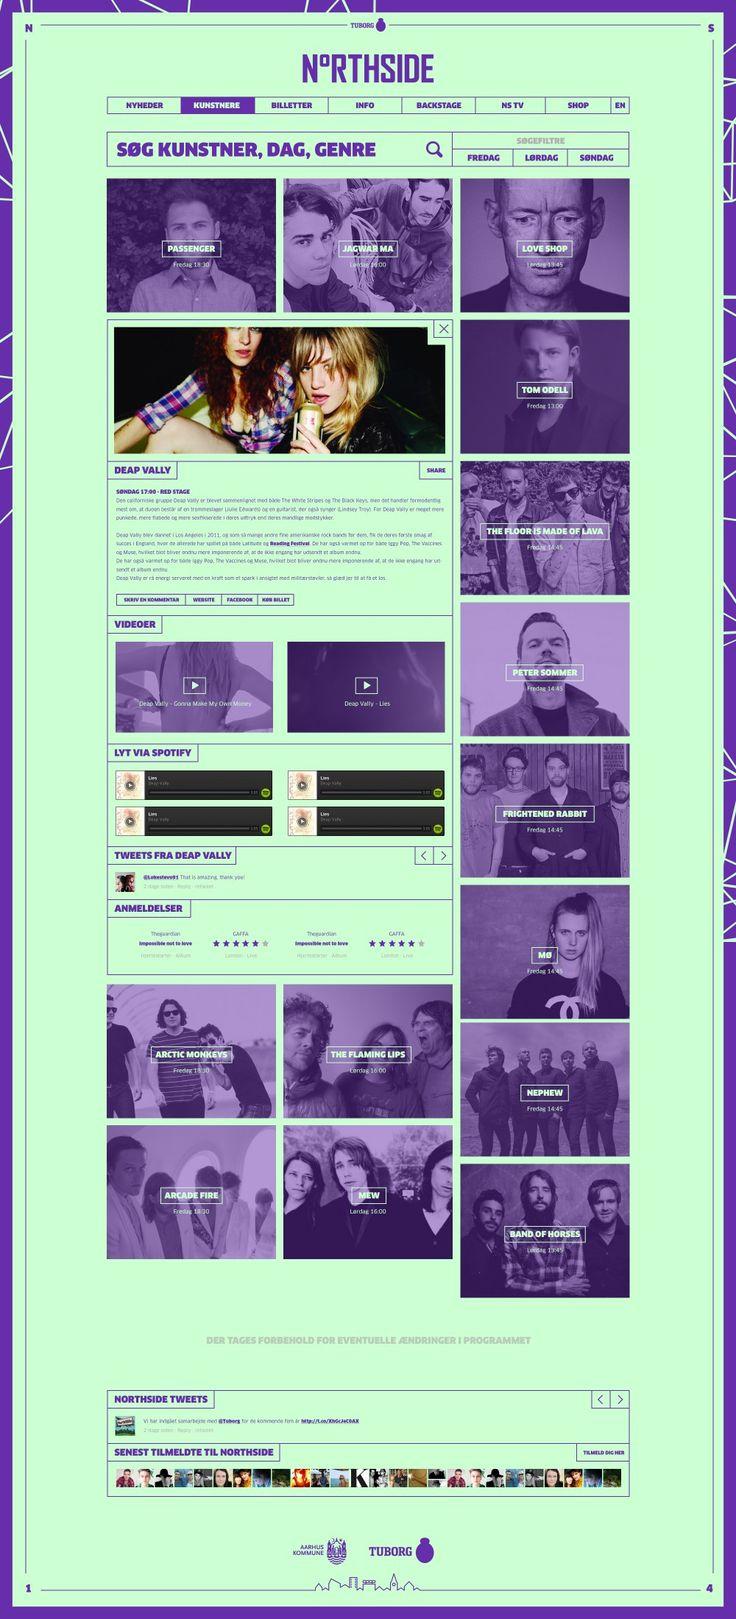 Amazing color use on this site - Northside 2014 – Music Festival   Designer: Morten Lybech